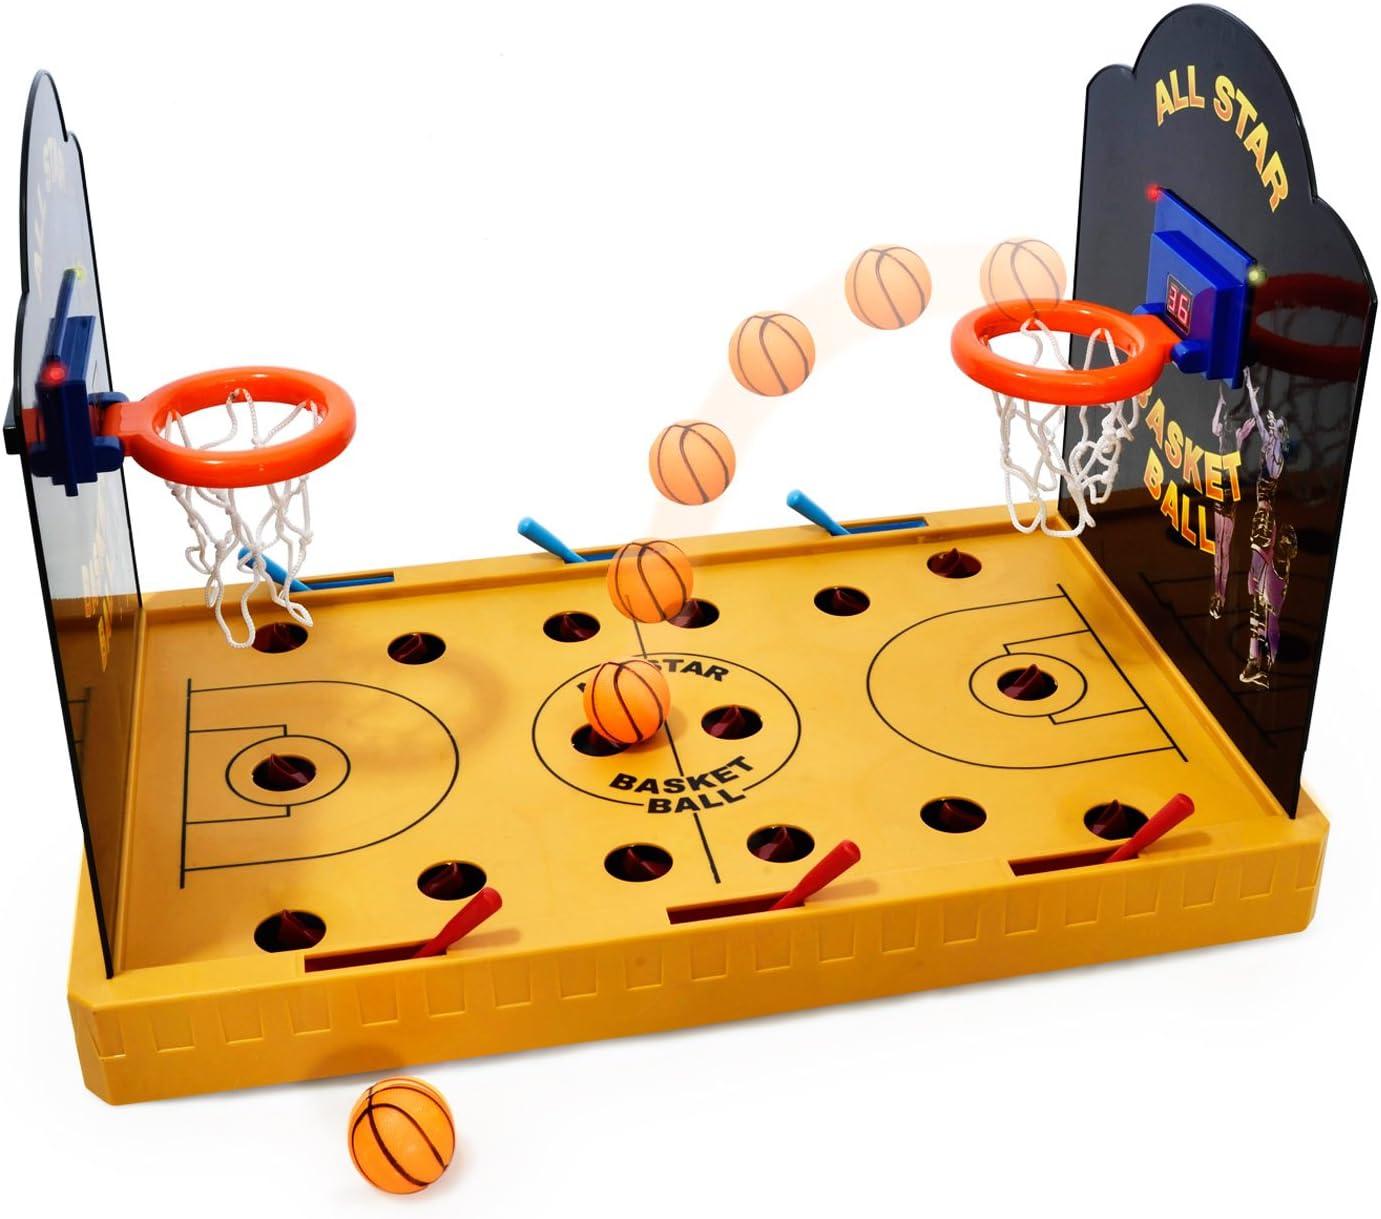 GOODS+GADGETS - Miniatura de baloncesto eléctrico: Amazon.es: Hogar